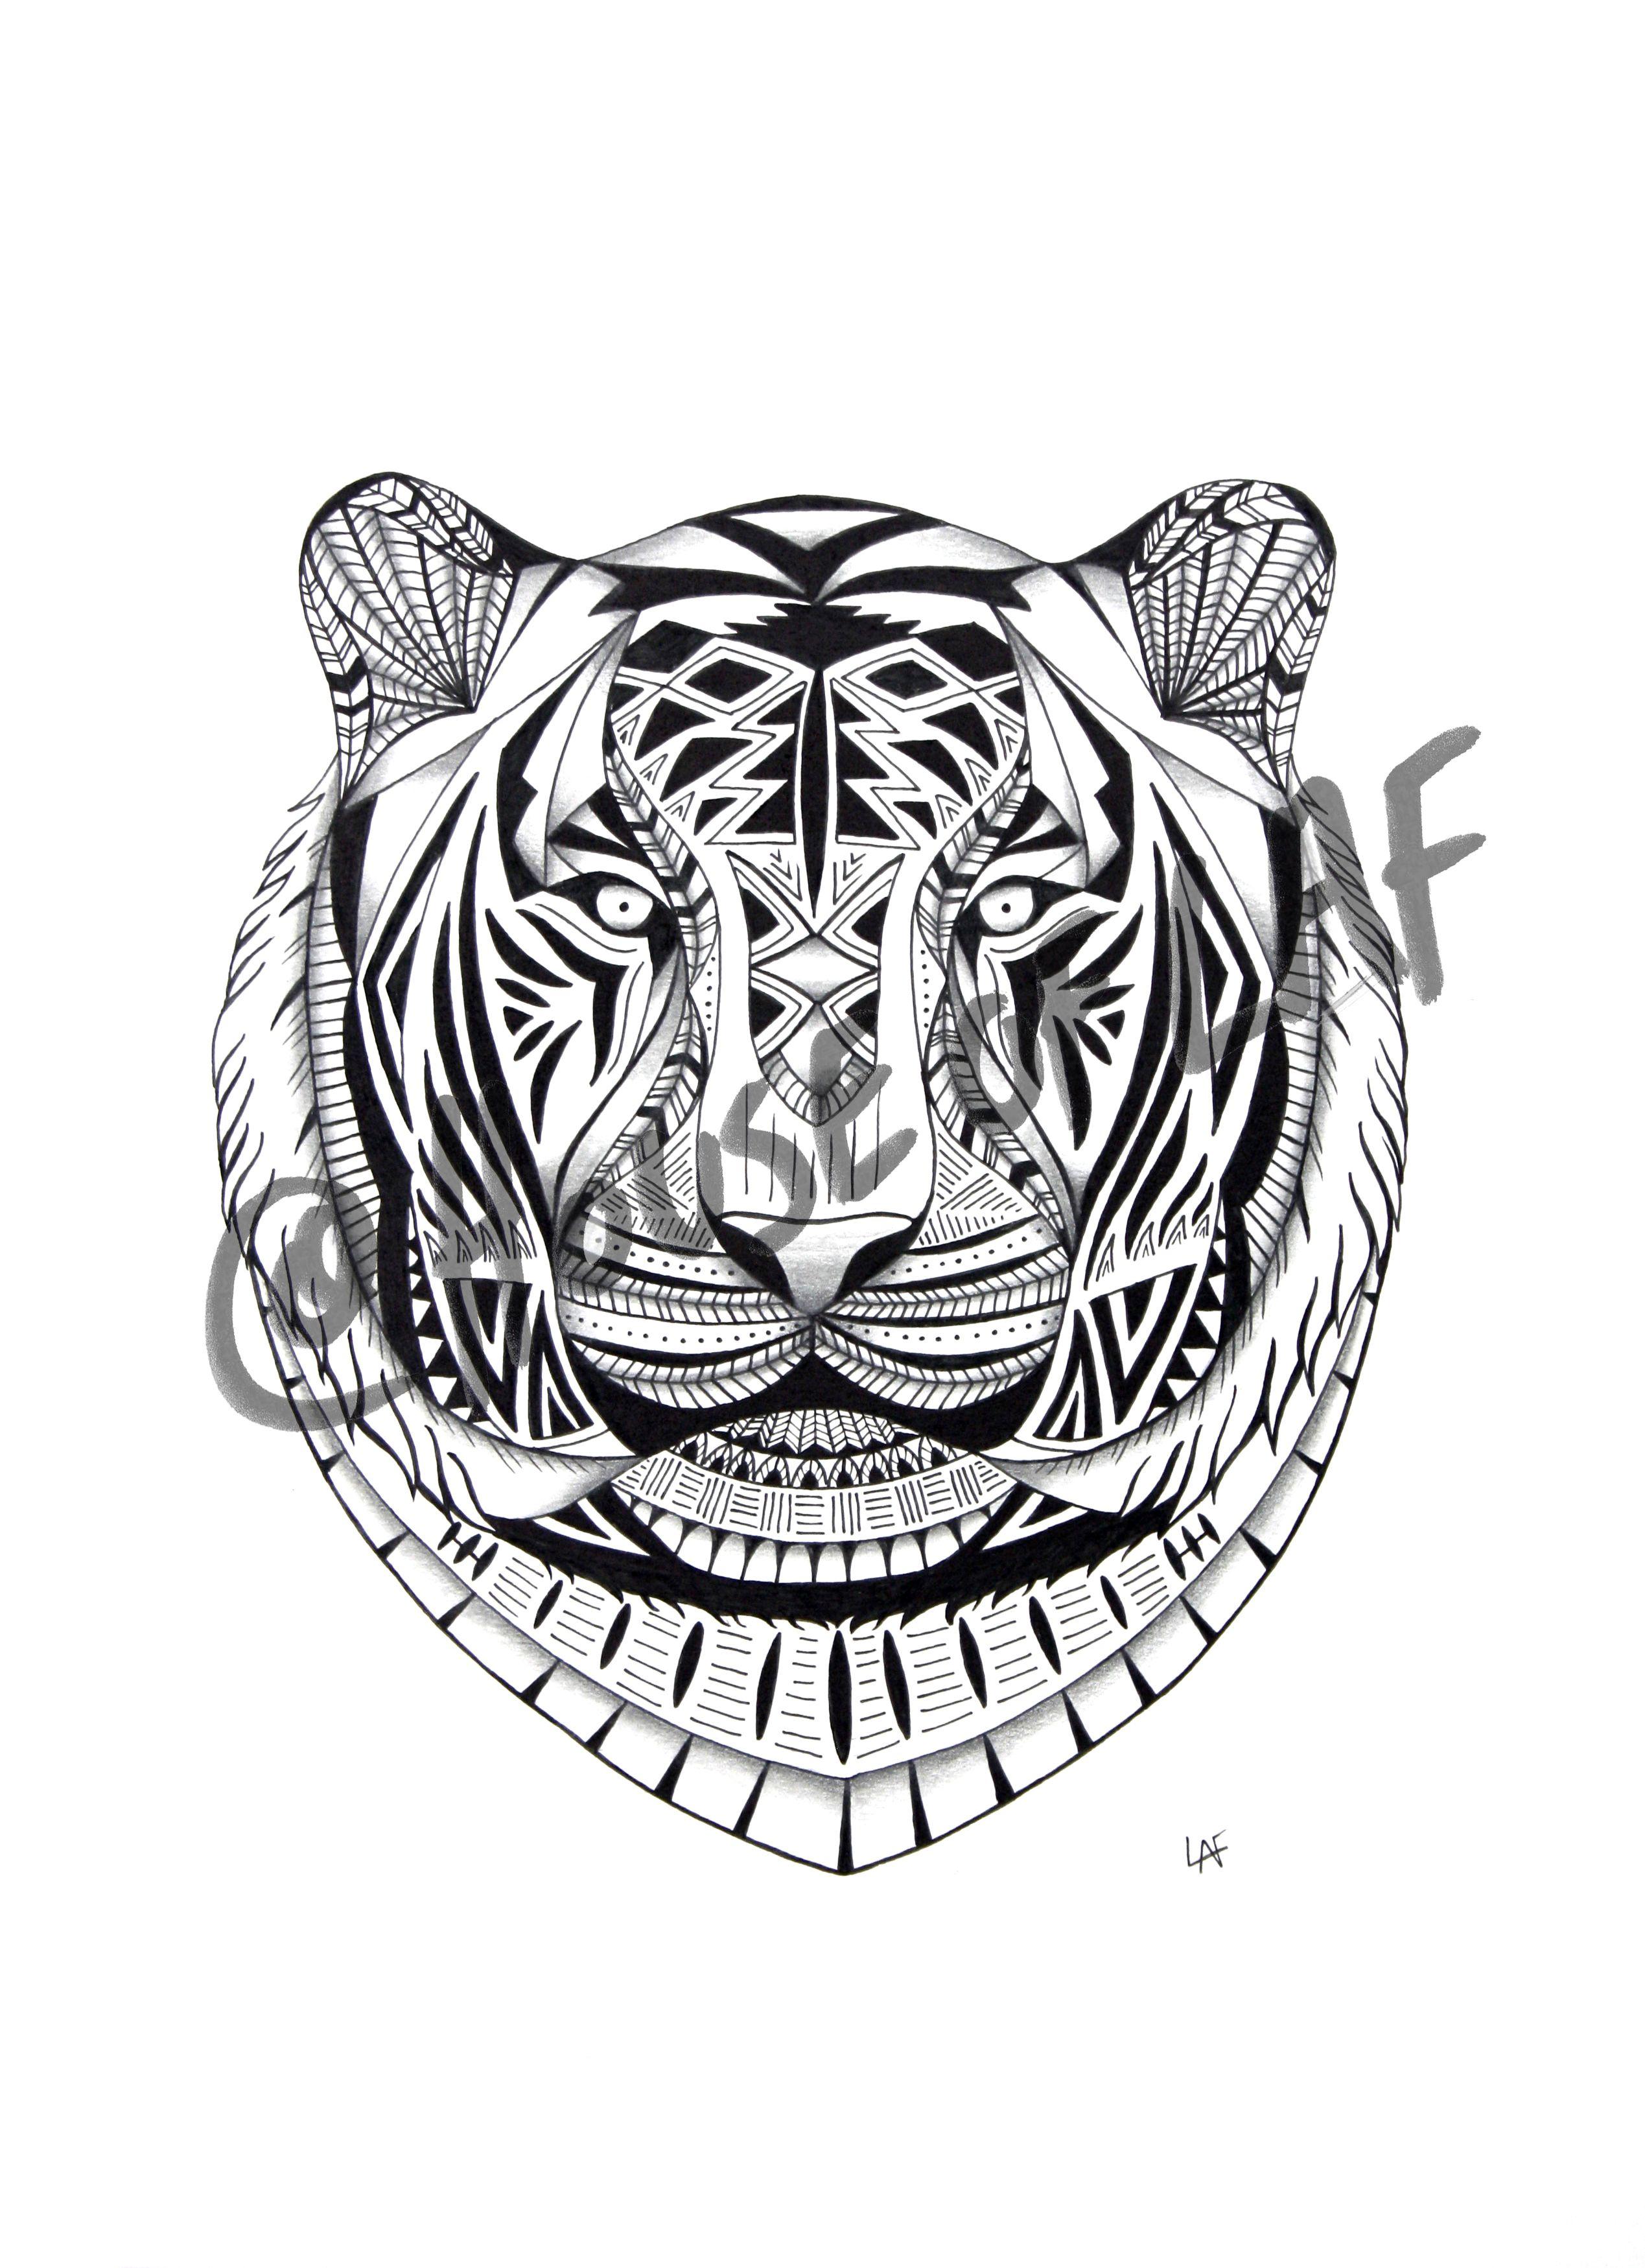 Black And White Tiger Illustration Art Tattoo Design By Houseoflaf Tiger Illustration Design Animal Tattoo